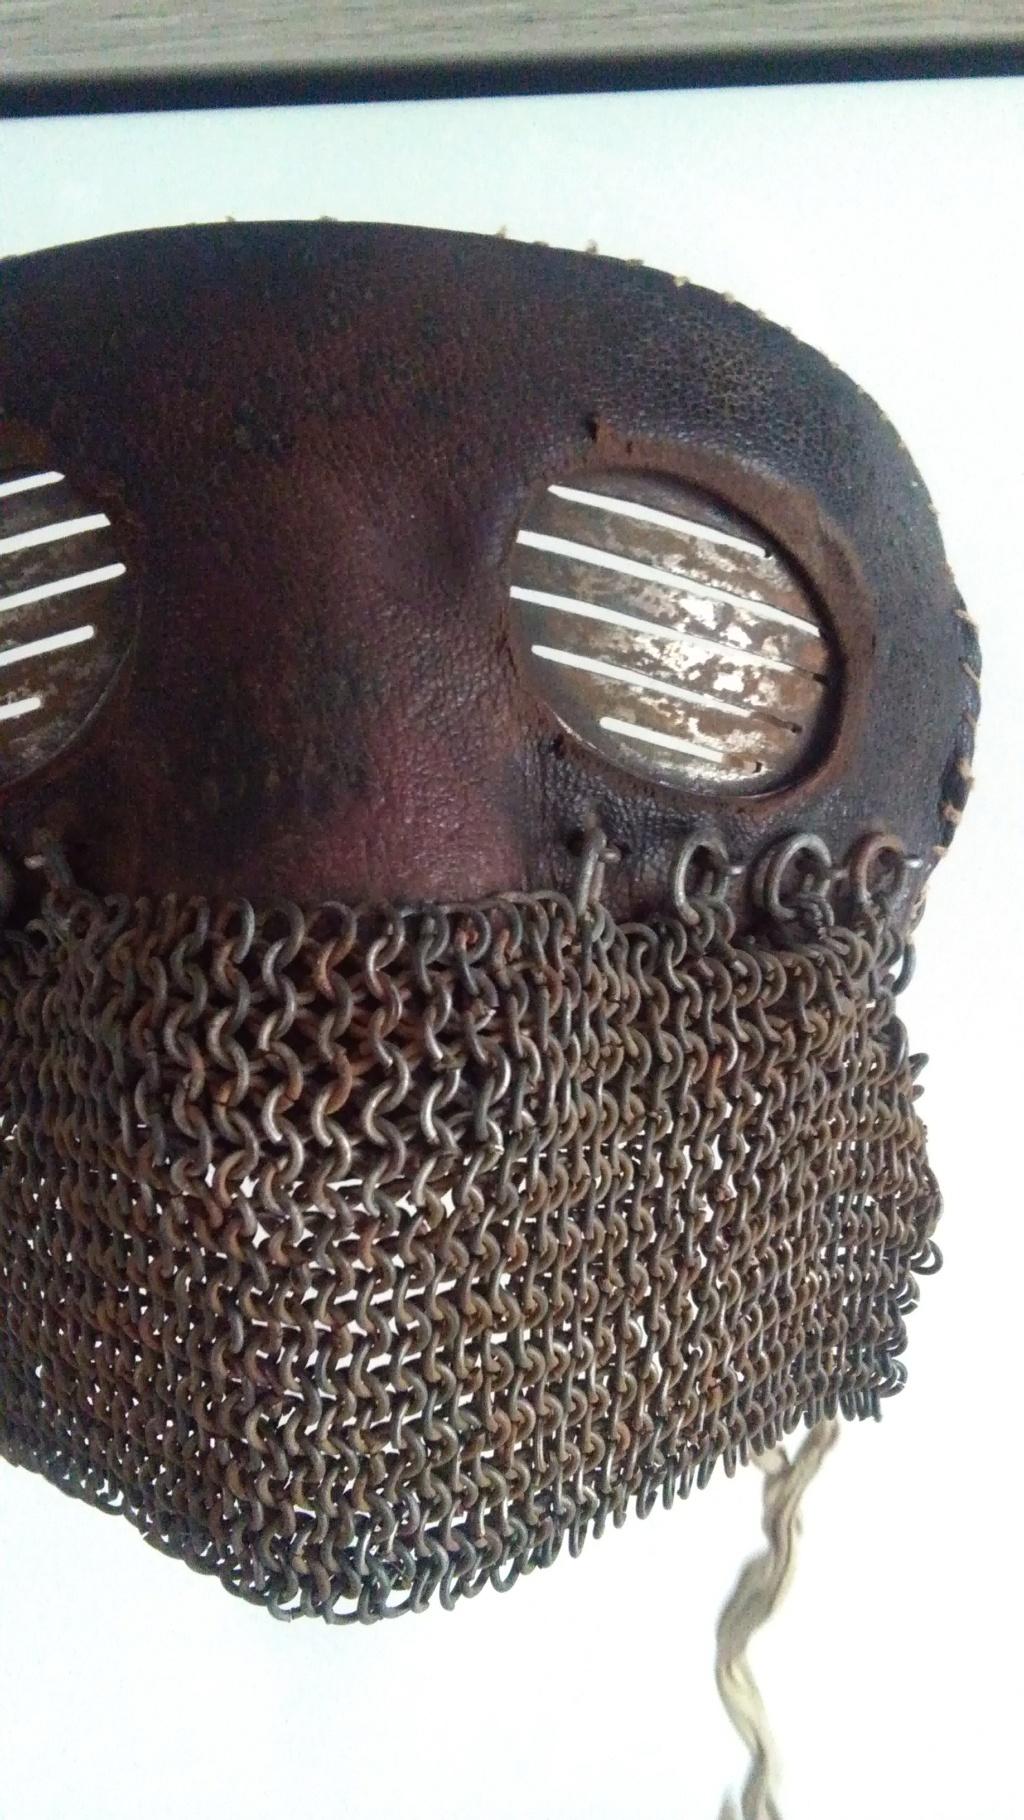 Masque de tankiste 1917 - 1918 Img_2072